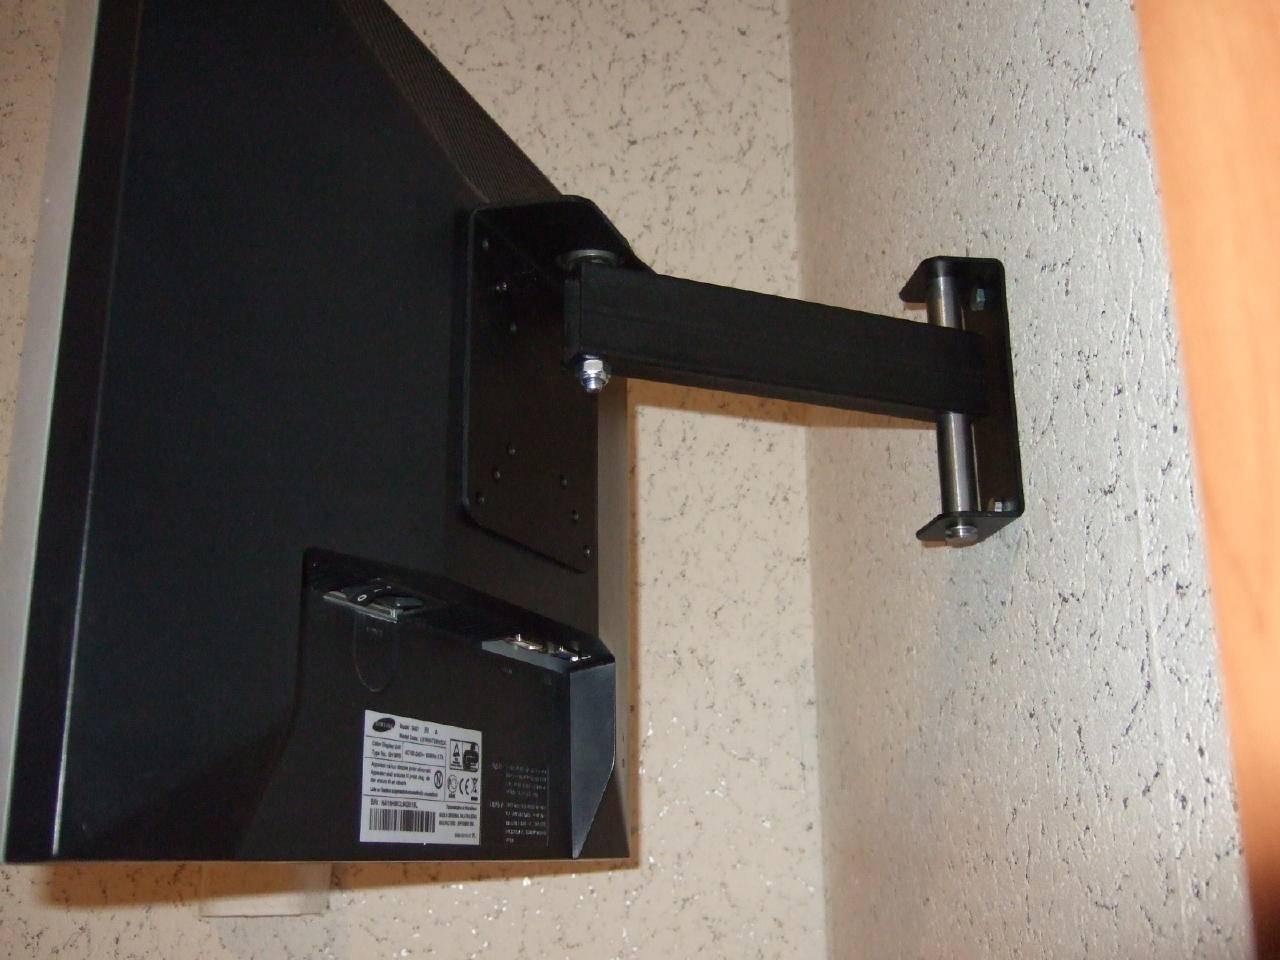 Как повесить телевизор без кронштейна на стену